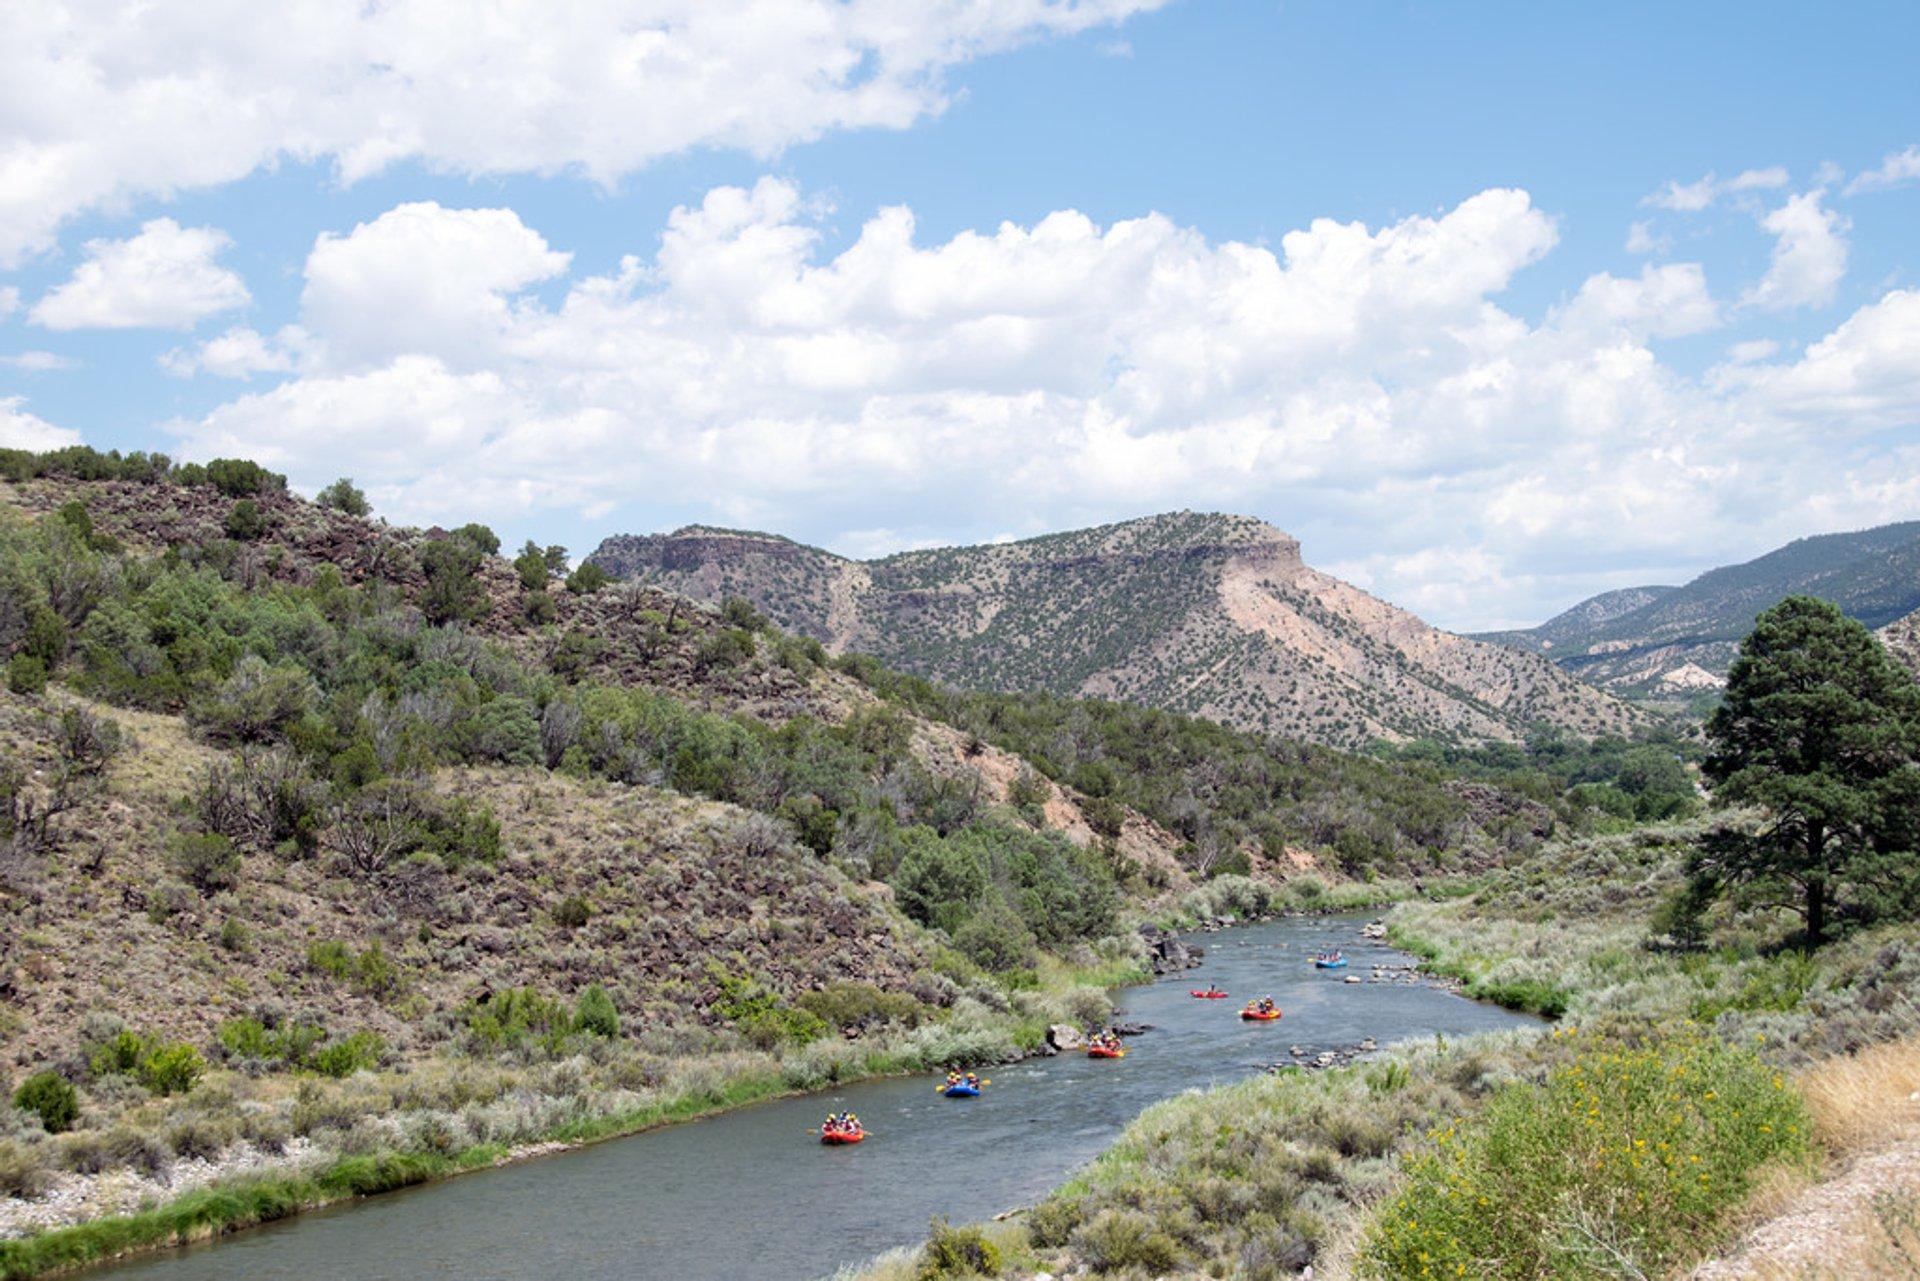 Rafting the Rio Grande in Texas - Best Season 2020